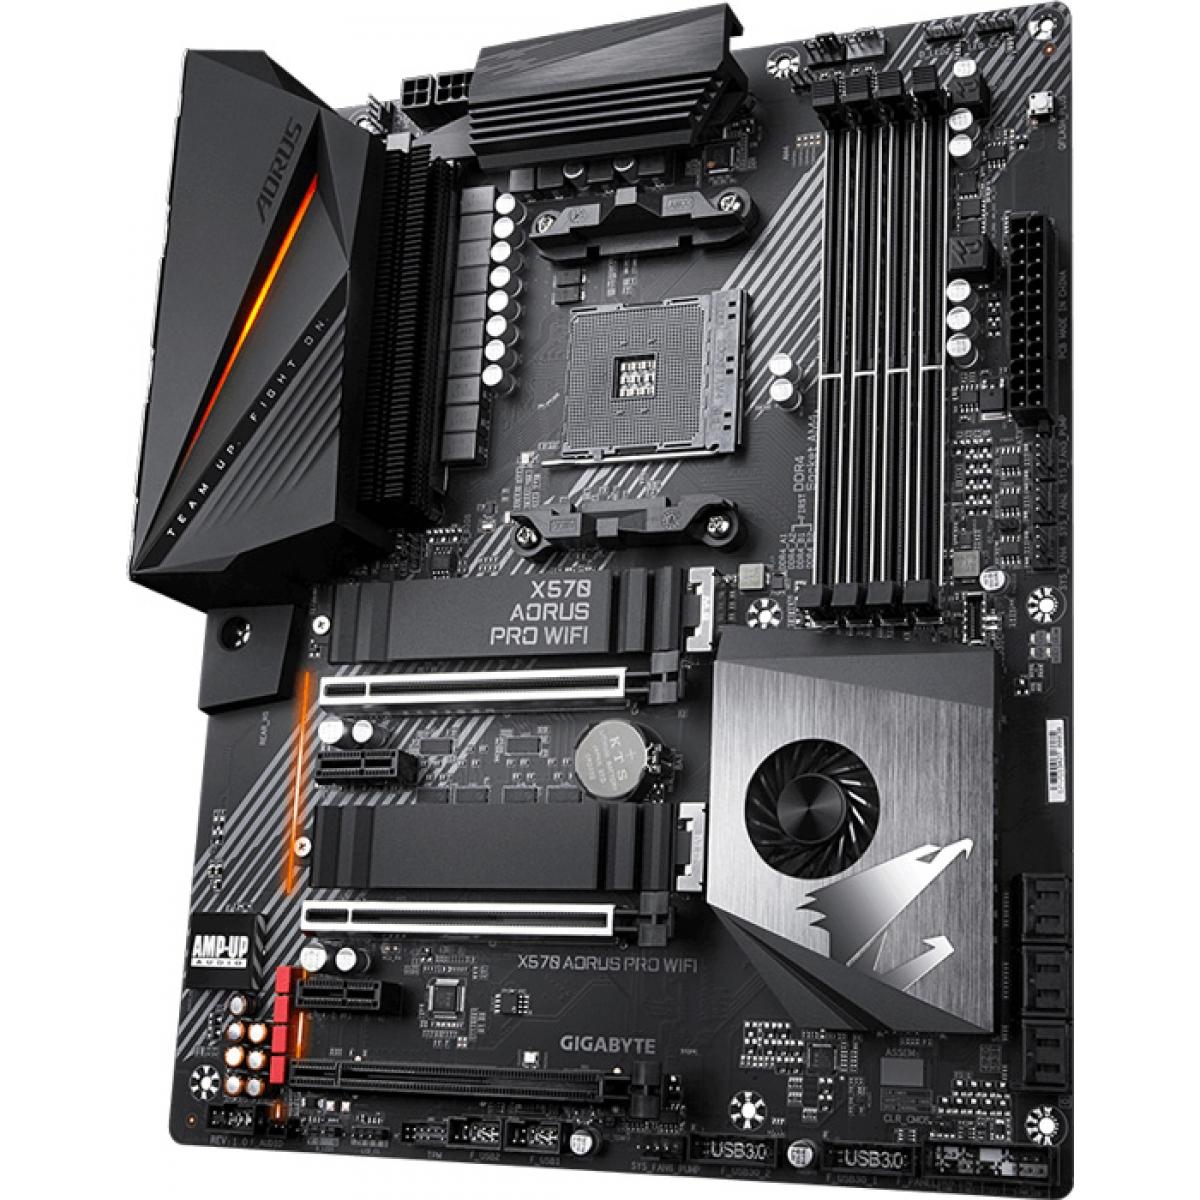 Placa Mãe Gigabyte, X570 Aorus Pro Wifi, Chipset X570, AMD AM4, ATX, DDR4, Rev. 1.1/1.2